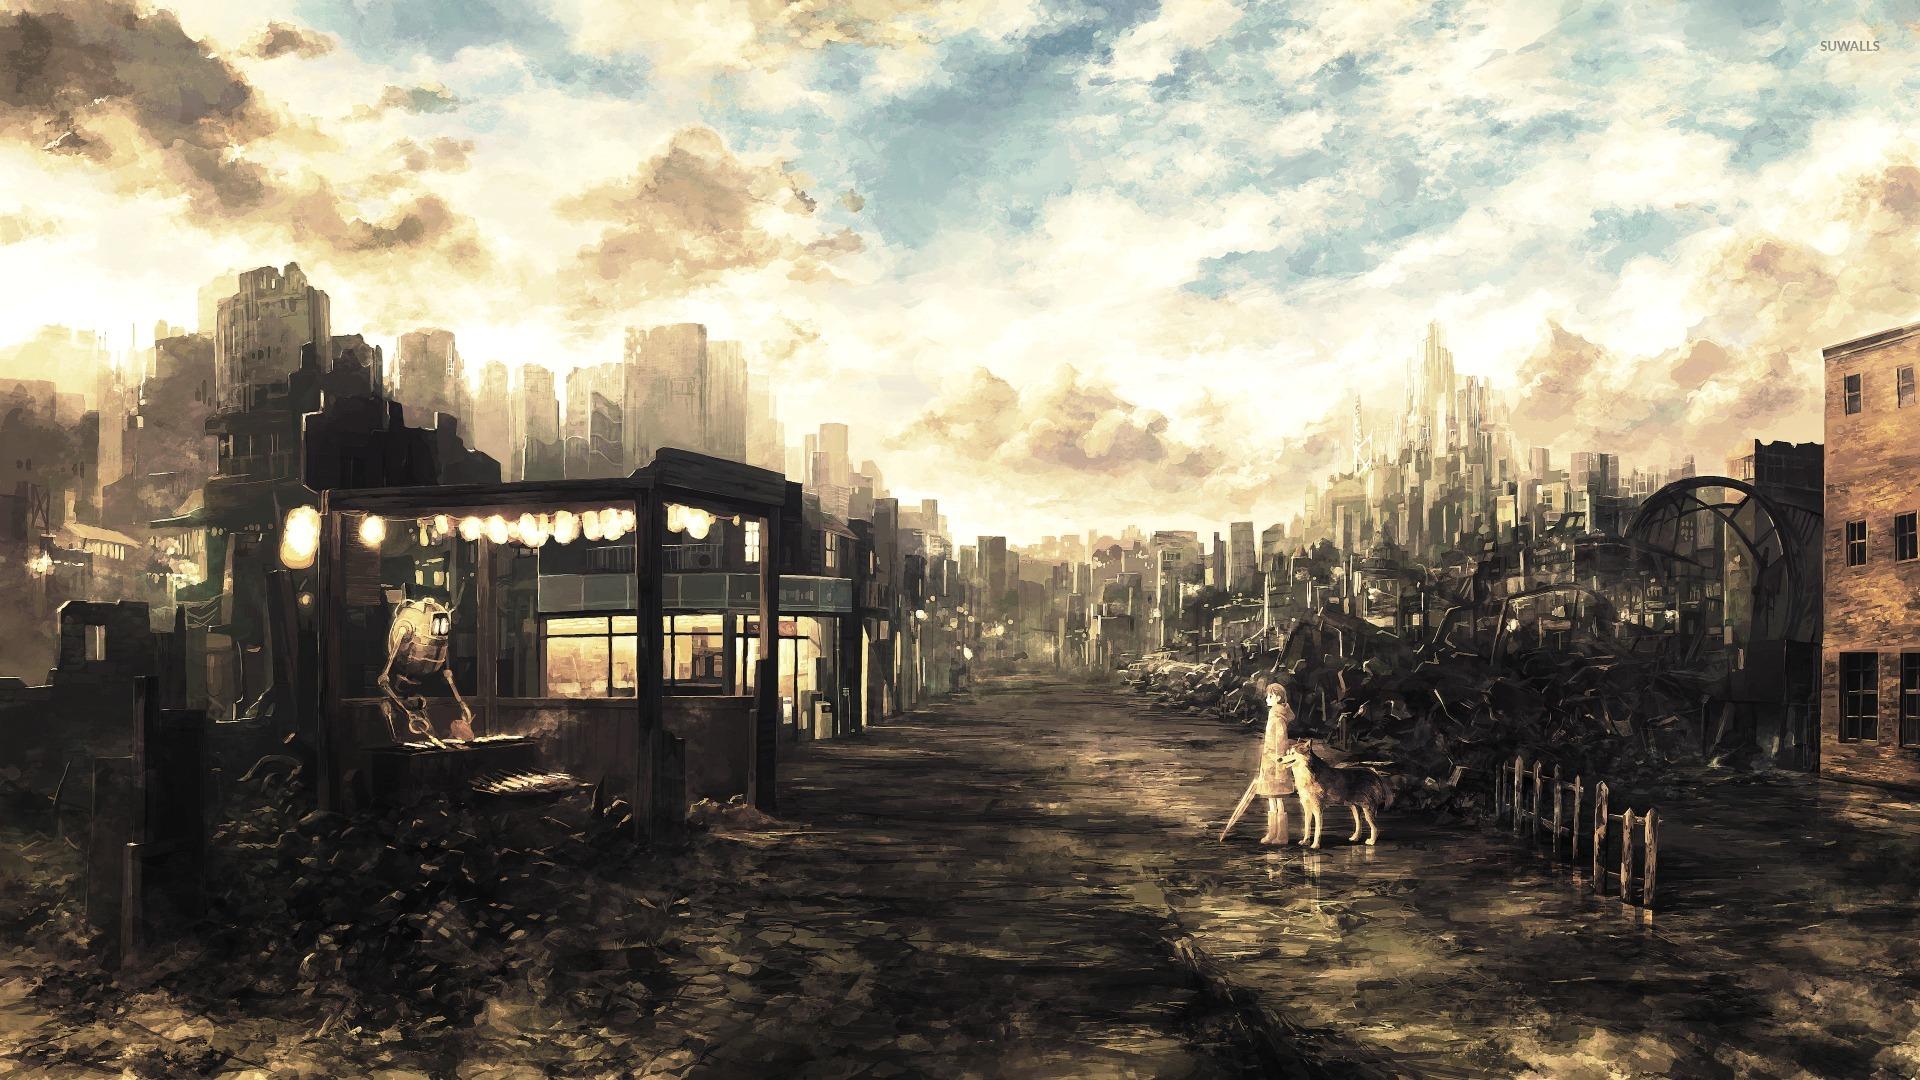 Post Apocalyptic Anime City Wallpaper Anime Wallpapers 30765